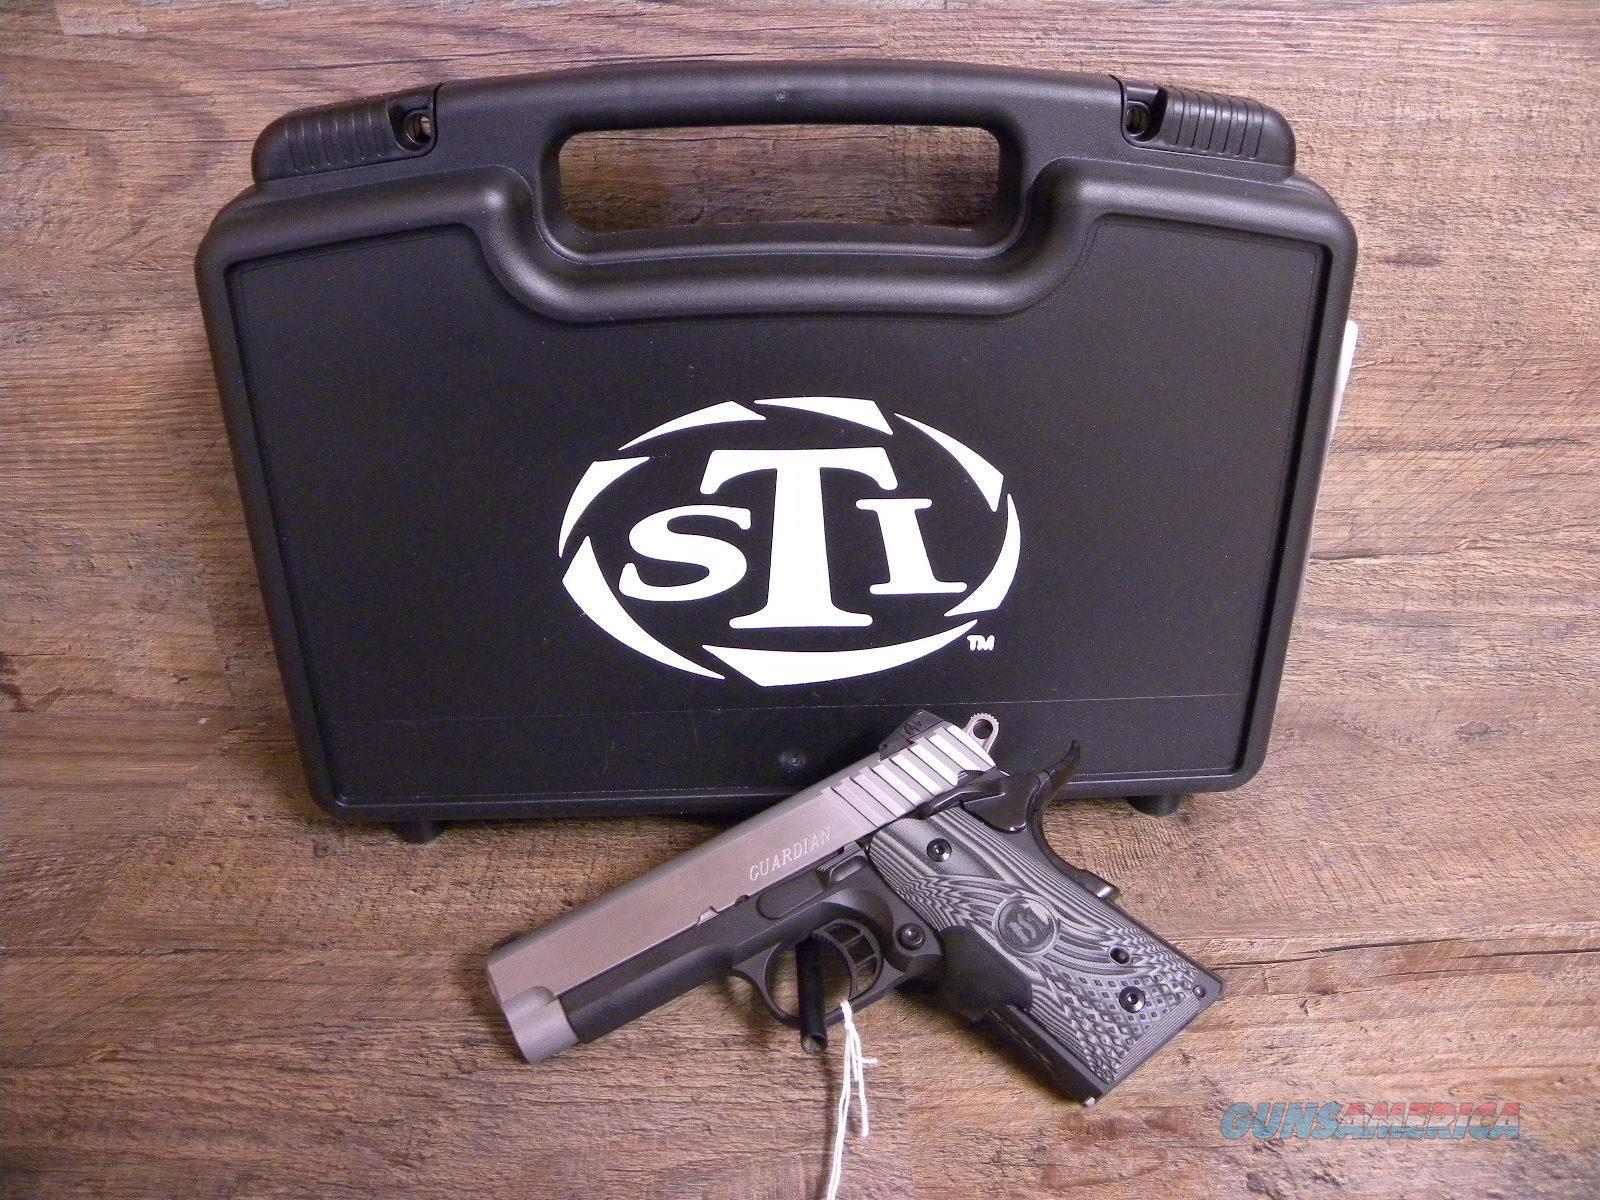 NIB STI Guardian 9mm 8+1 Crimson Trace Grips  Guns > Pistols > STI Pistols